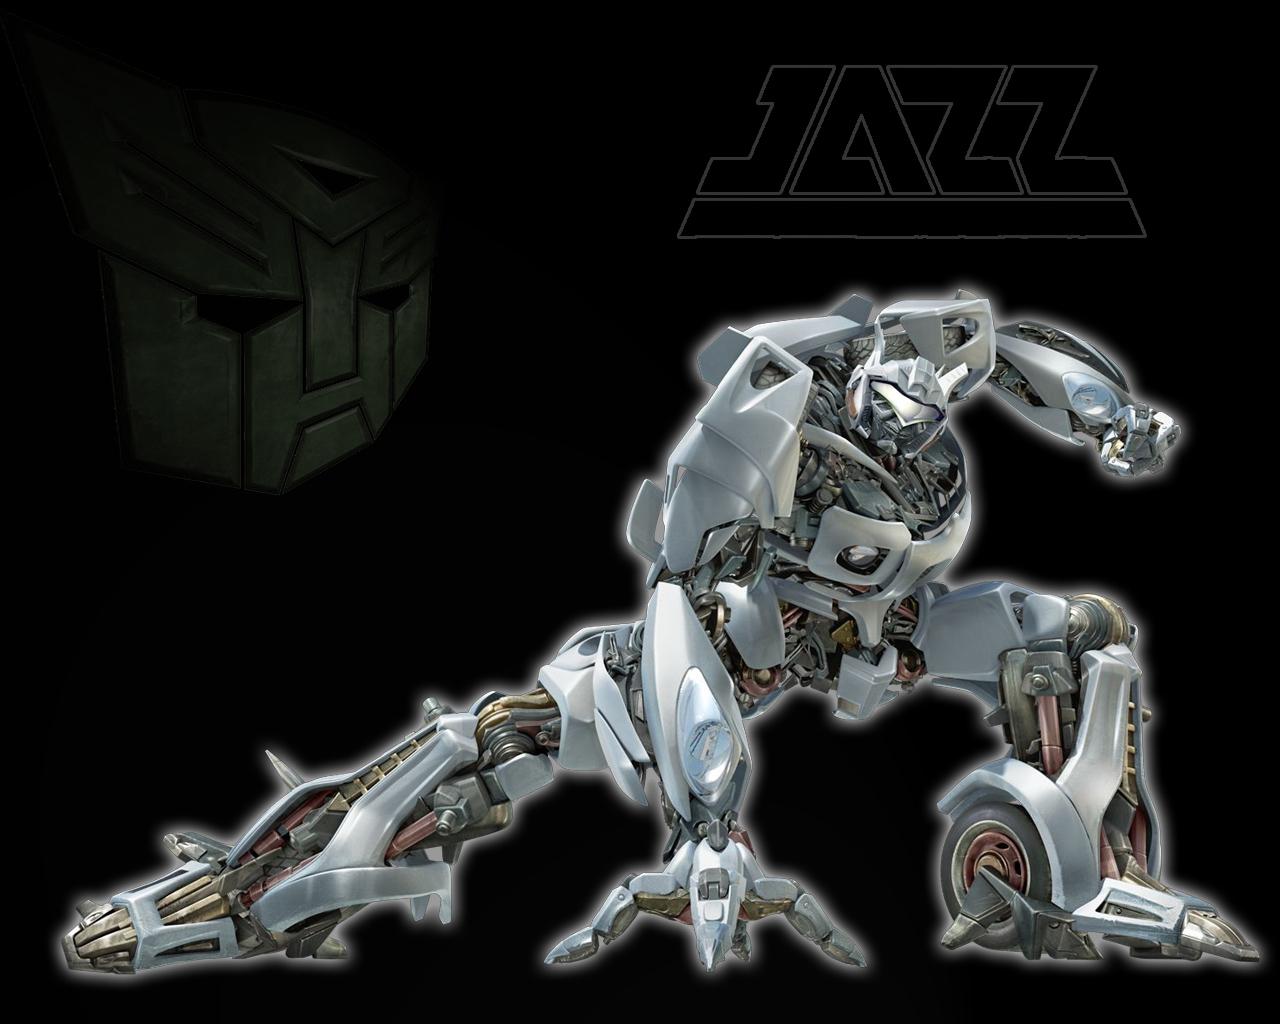 Download Transformers Movie wallpaper Transformers movie 3 1280x1024